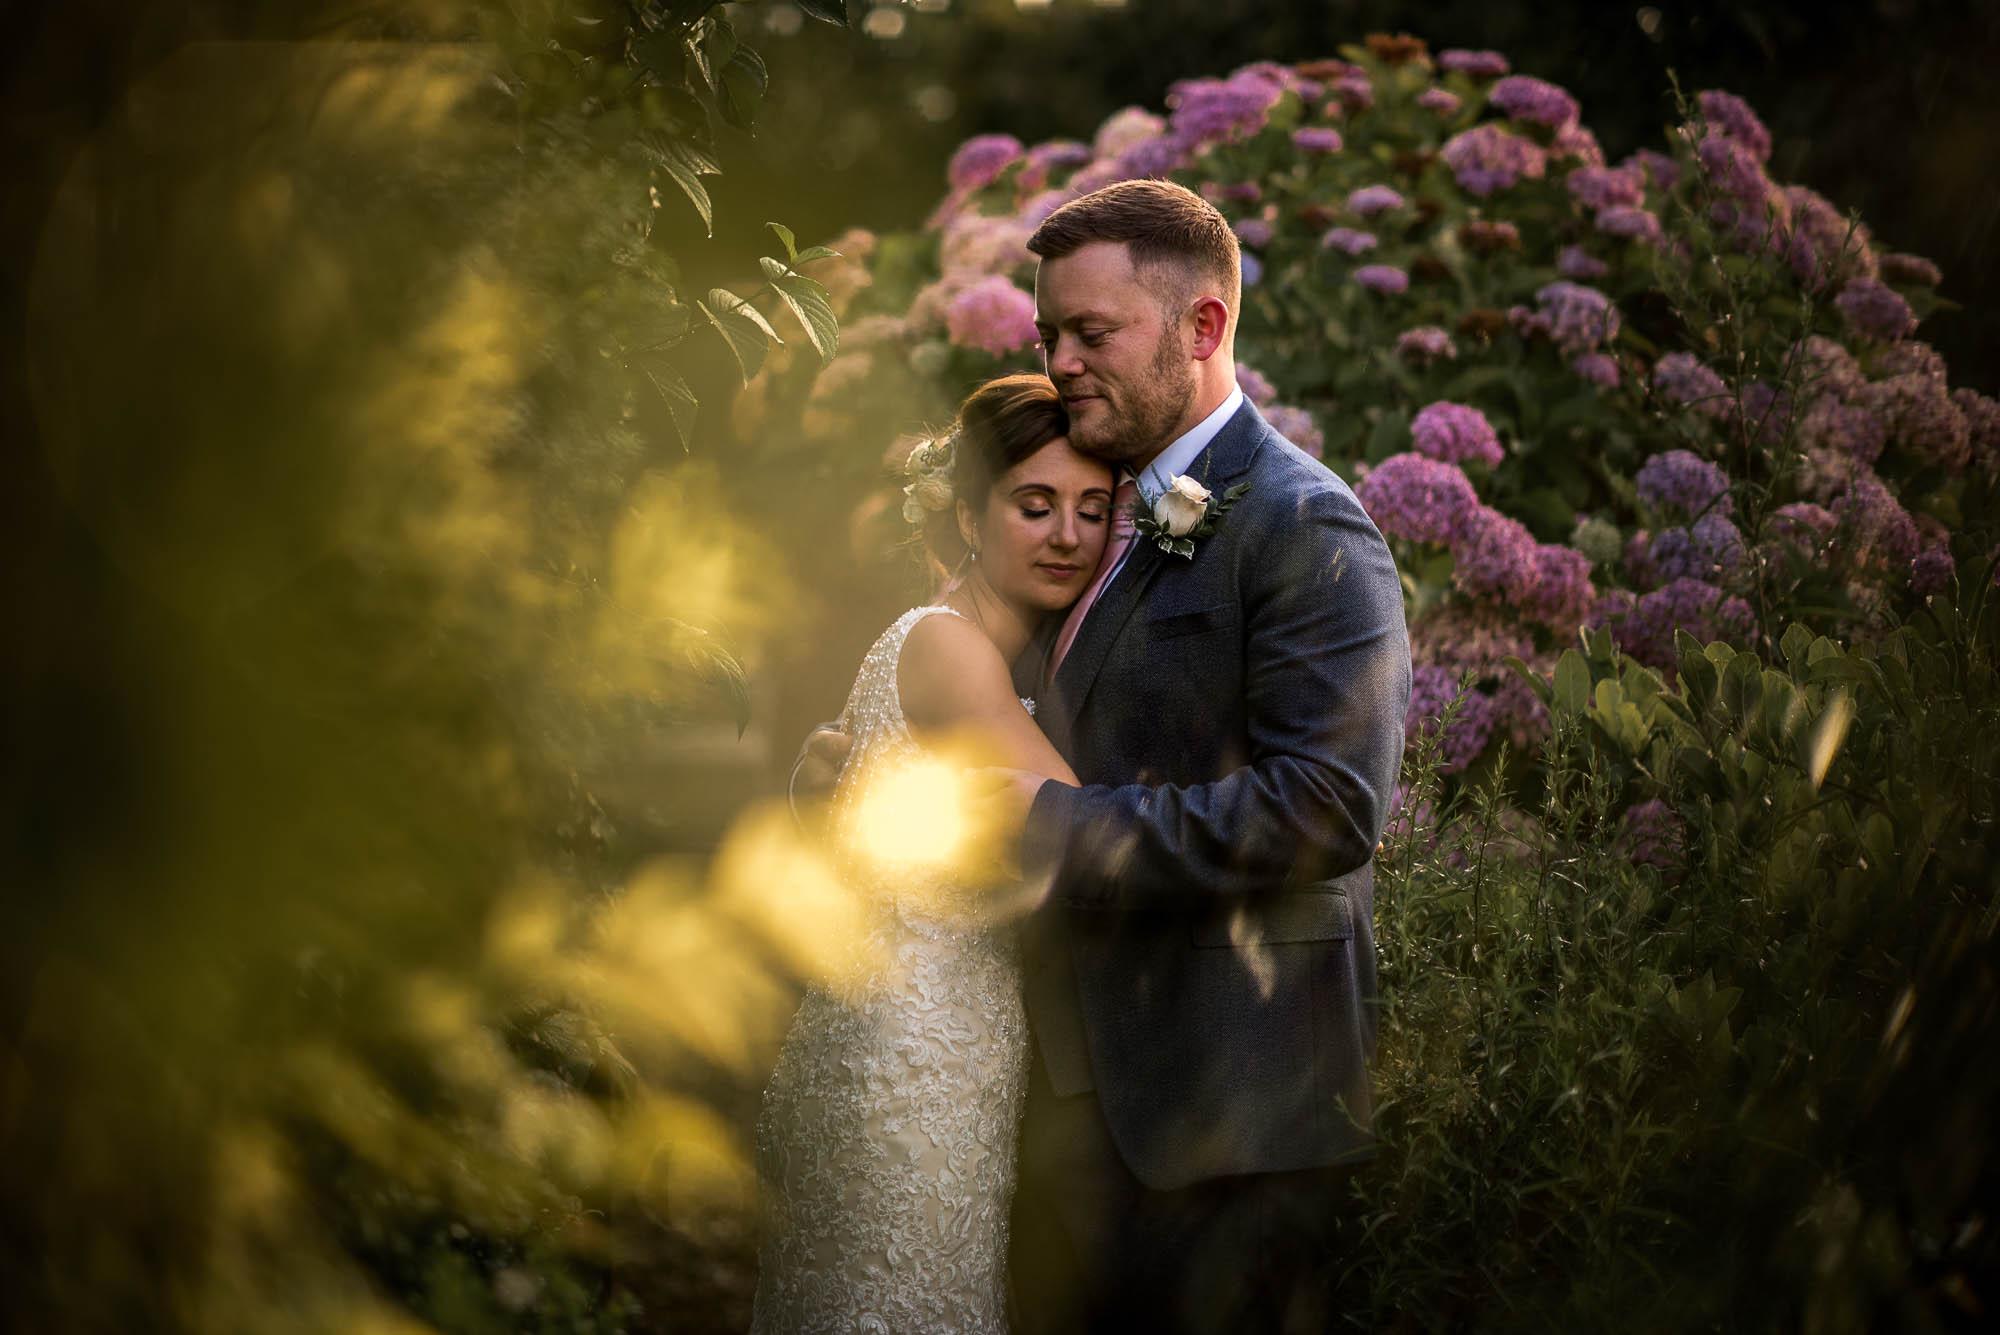 Curradine Barns Wedding Worcester Adam Lowndes Photography Staffordshire Wedding Photography